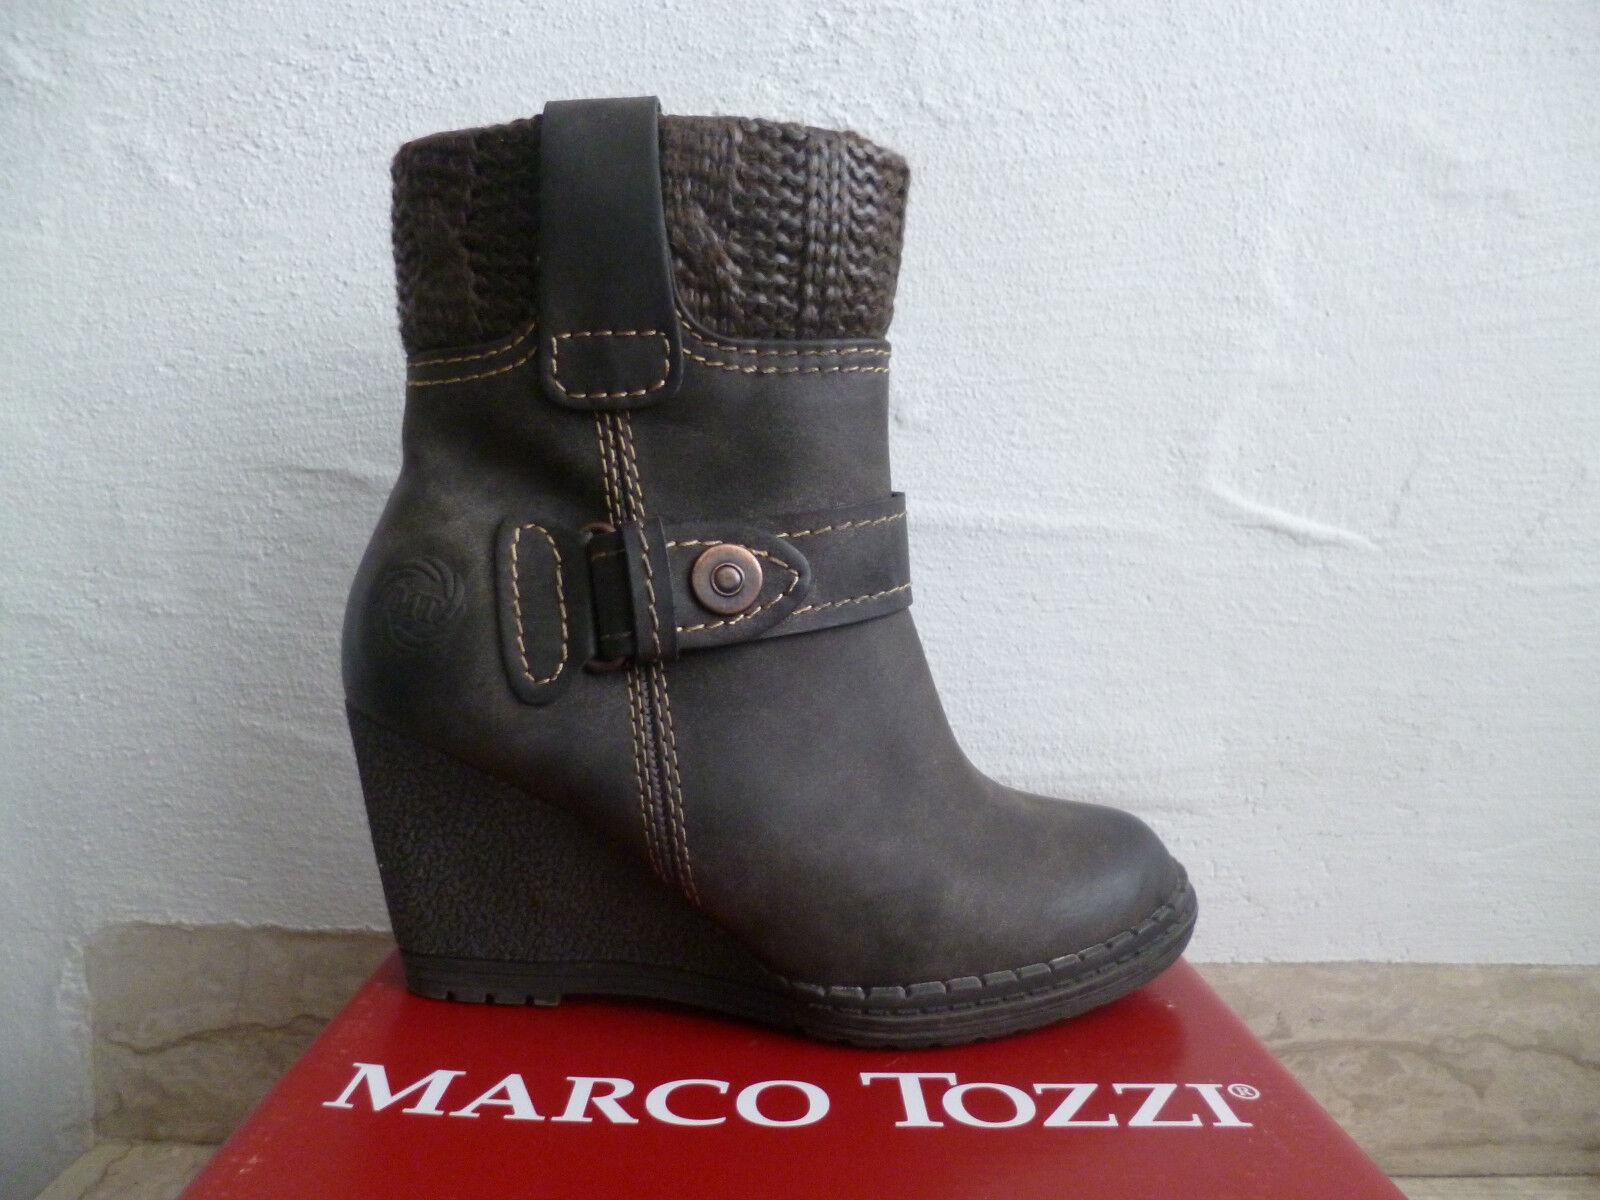 reputable site 47c2d 68dcc Marco Tozzi Damen Stiefel Stiefeletten Stieflette Boots Keilabsatz braun  NEU!